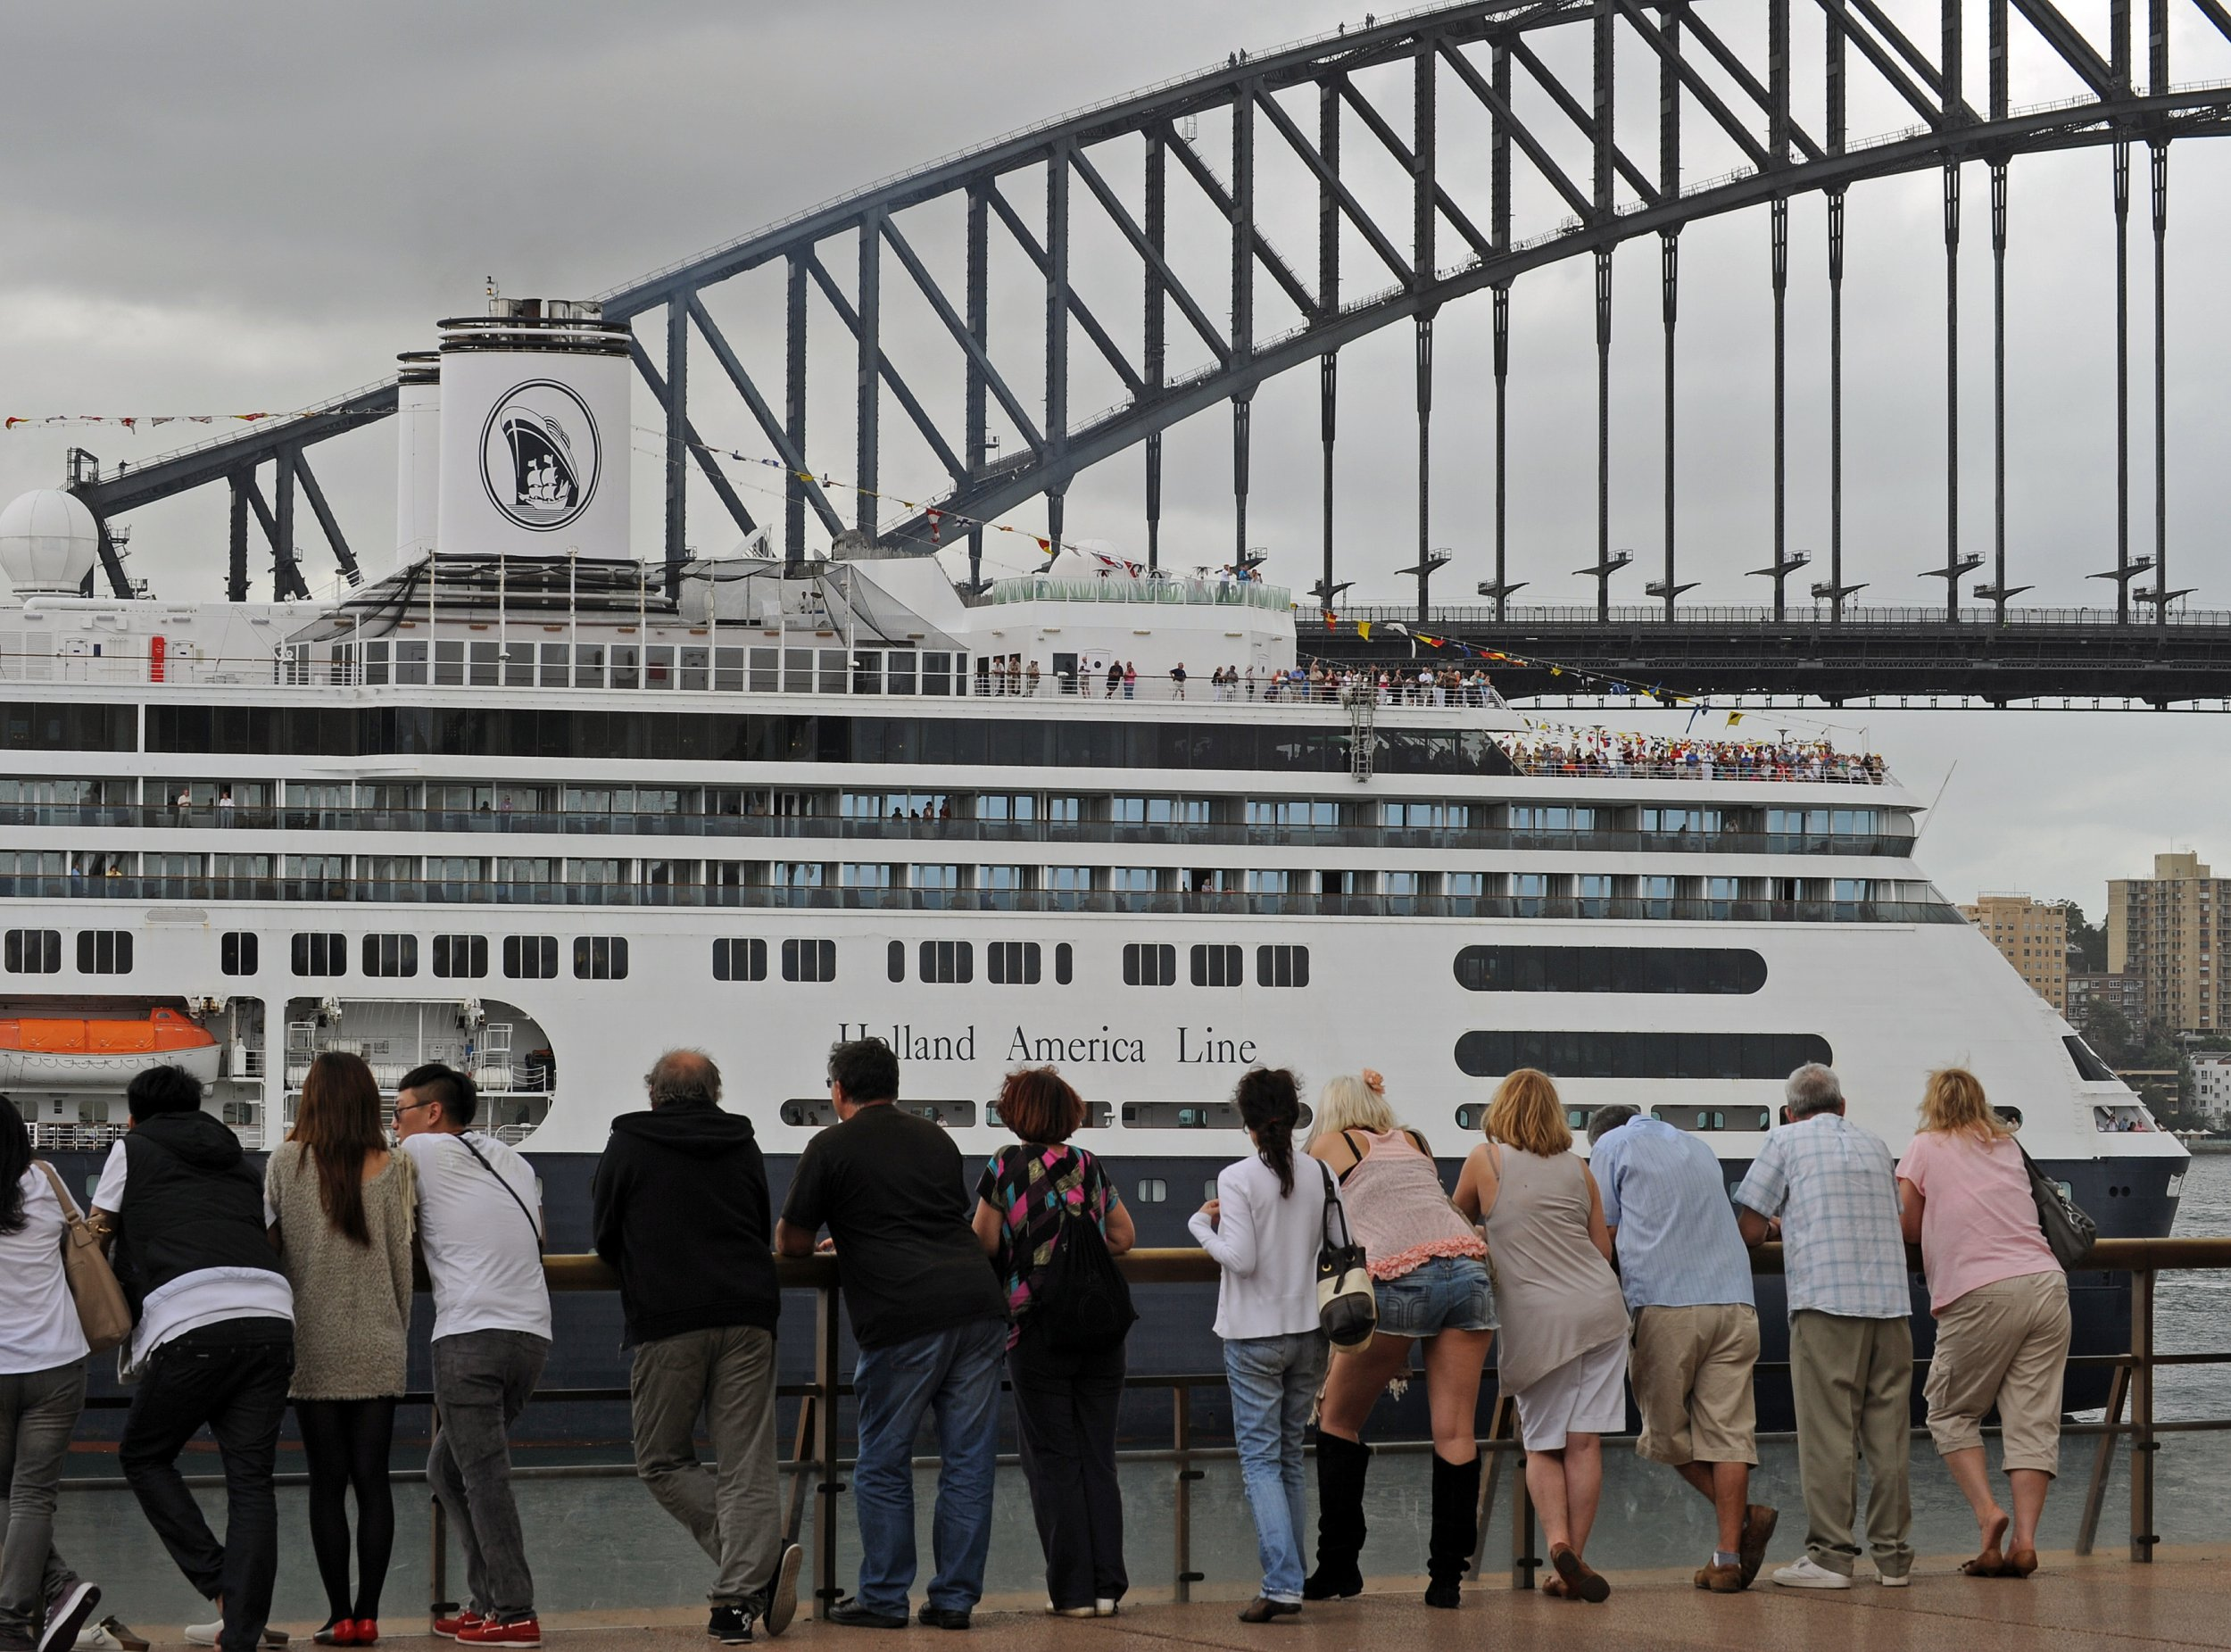 cruise ship florida amsterdam woman overboard